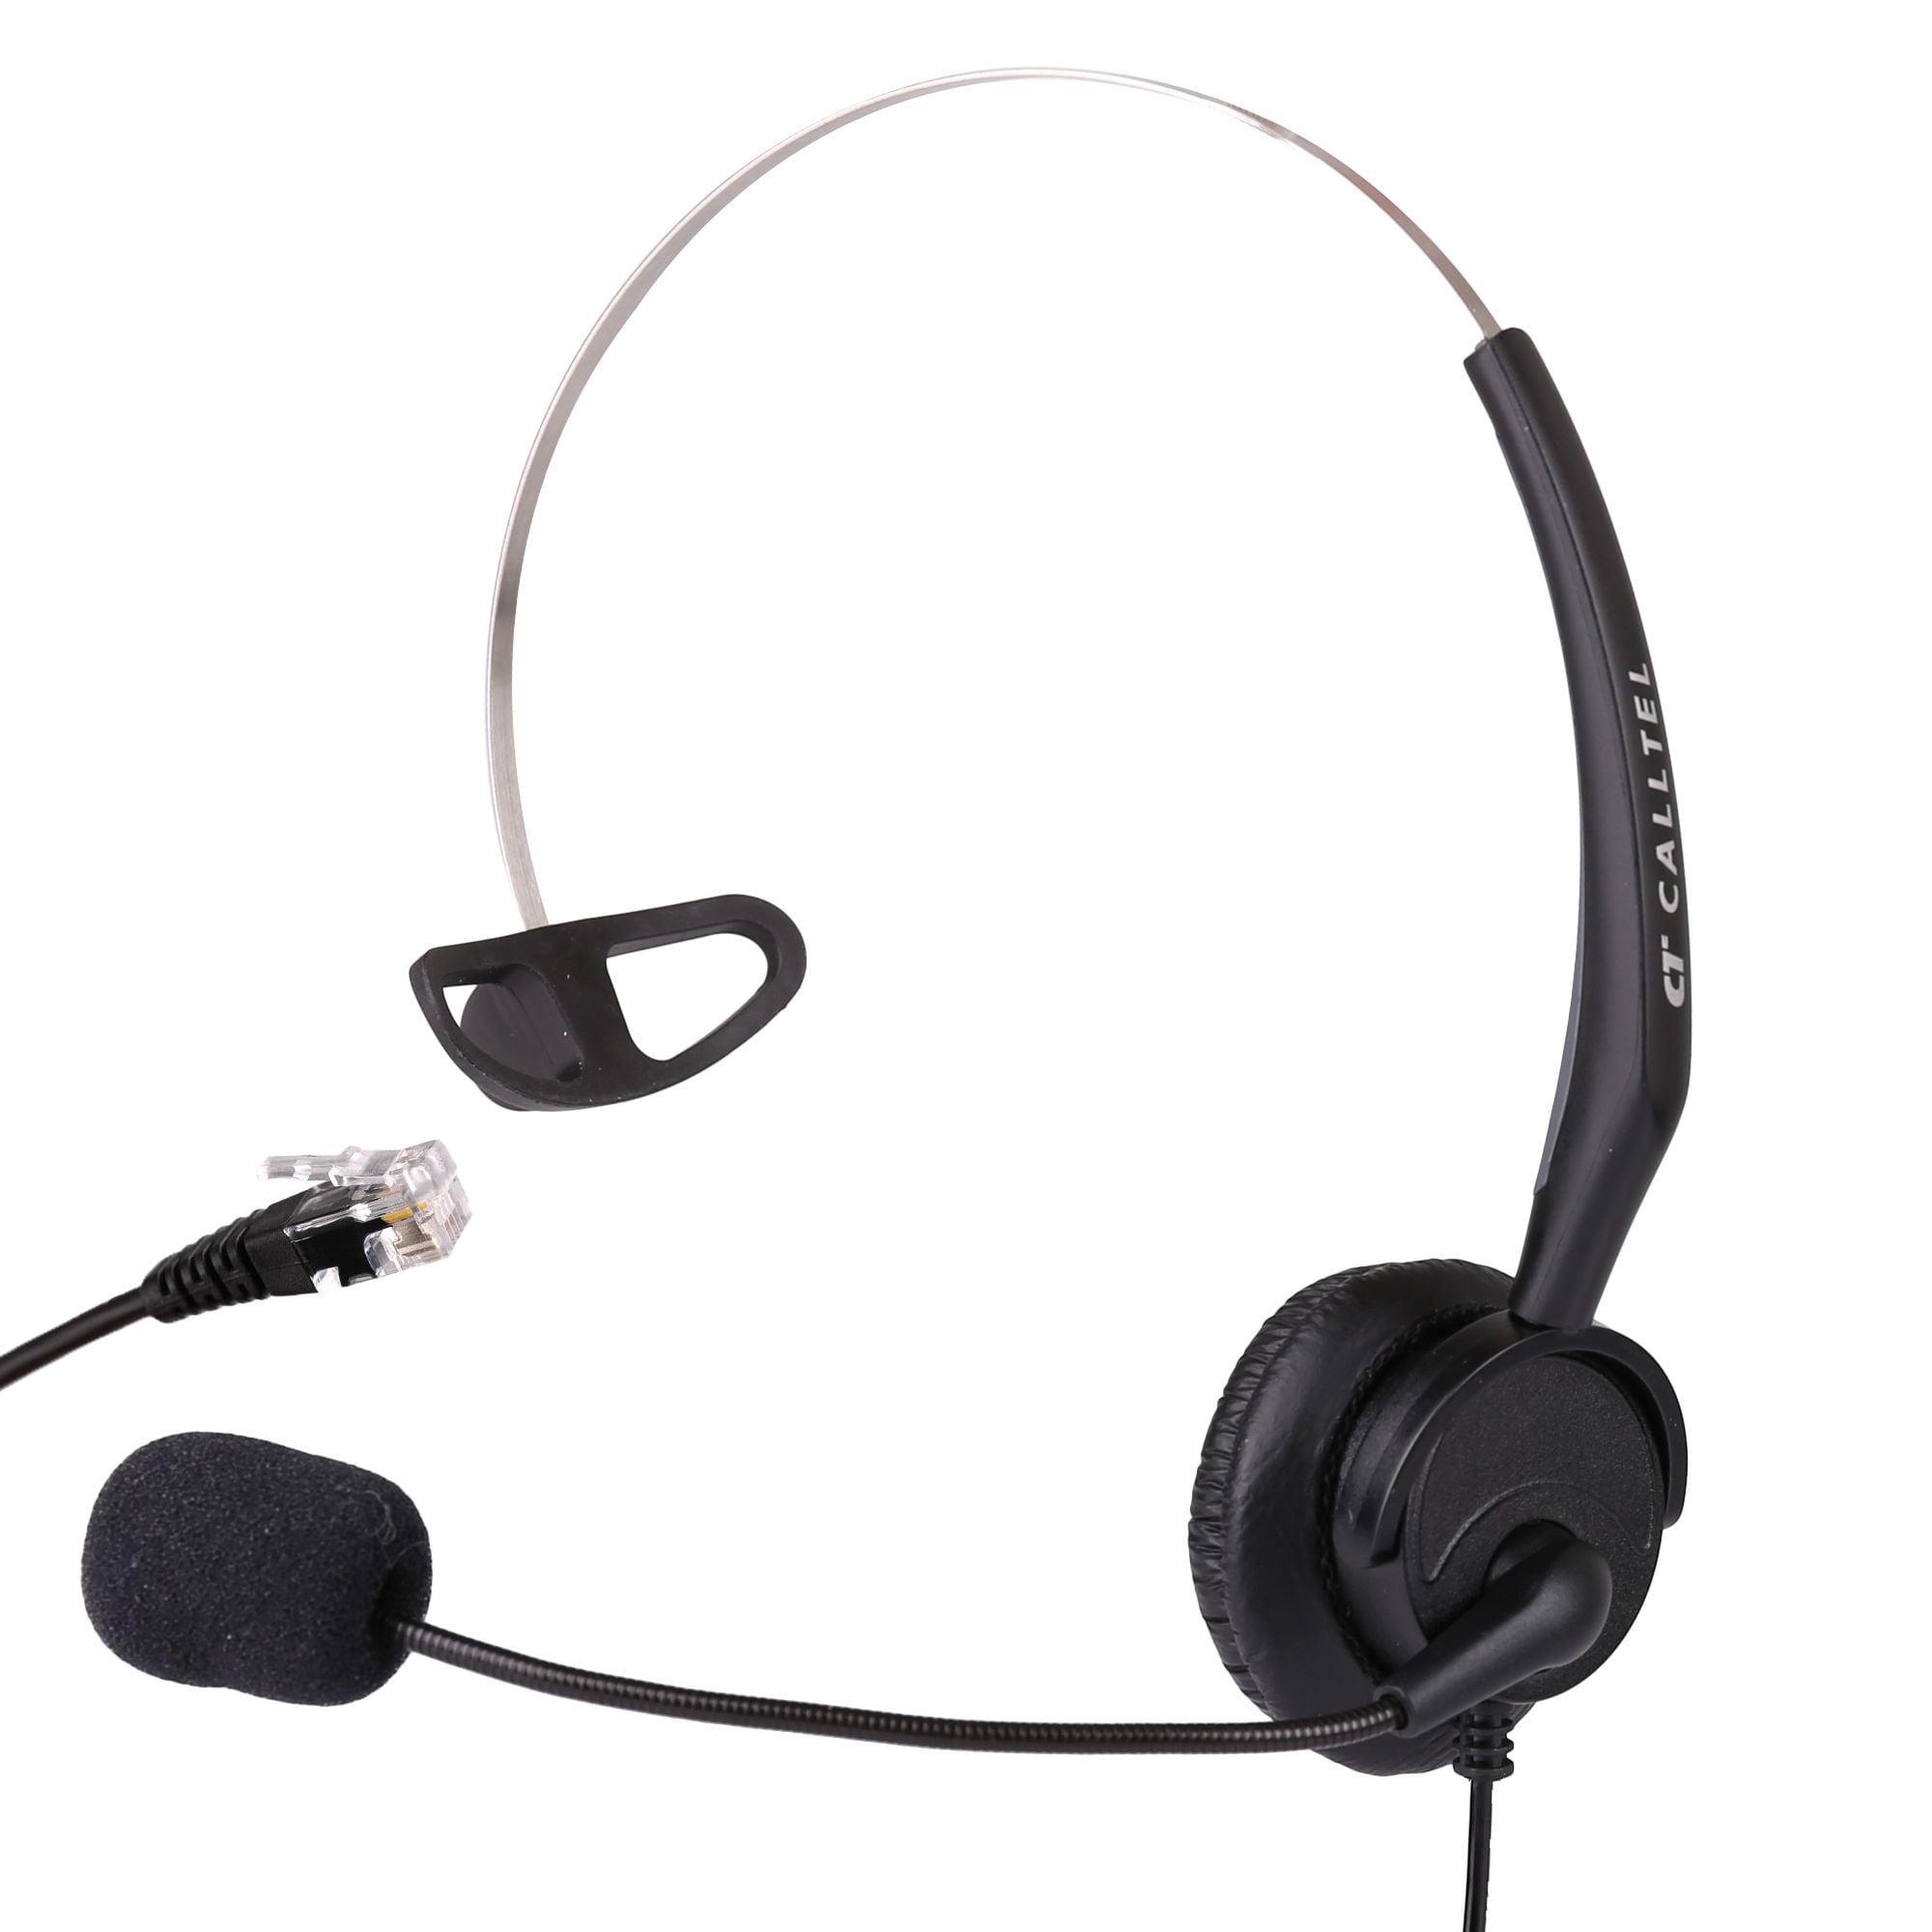 Strata CIX New T400 Headset Headphone For Toshiba DKT-3020SD DP5022-SD